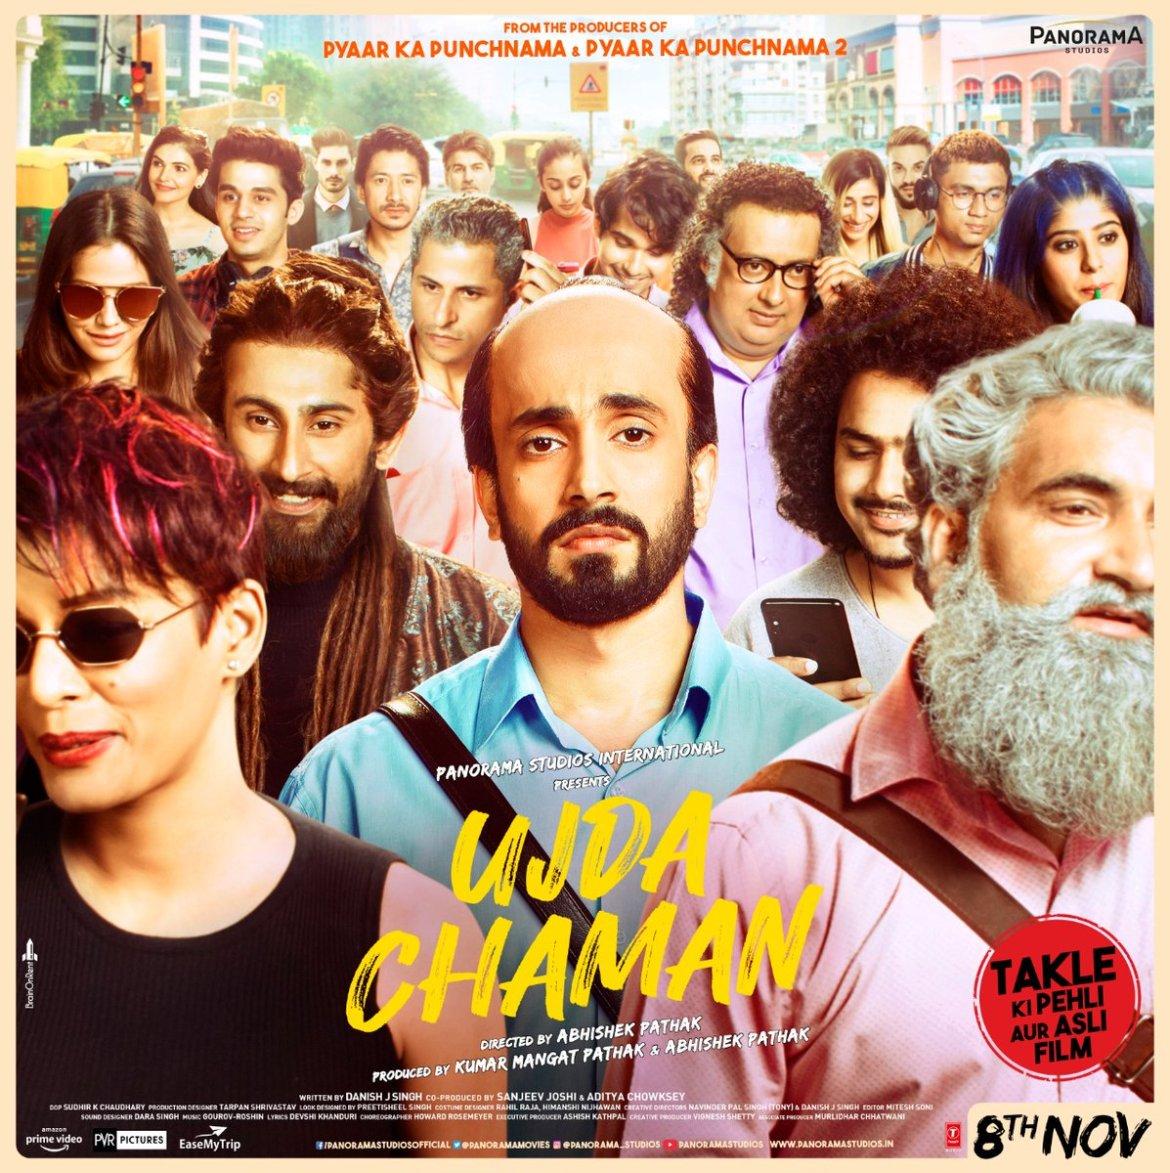 Ujda Chaman Official Trailer | Sunny Singh, Maanvi Gagroo | Abhishek Pathak | Releasing 8th November